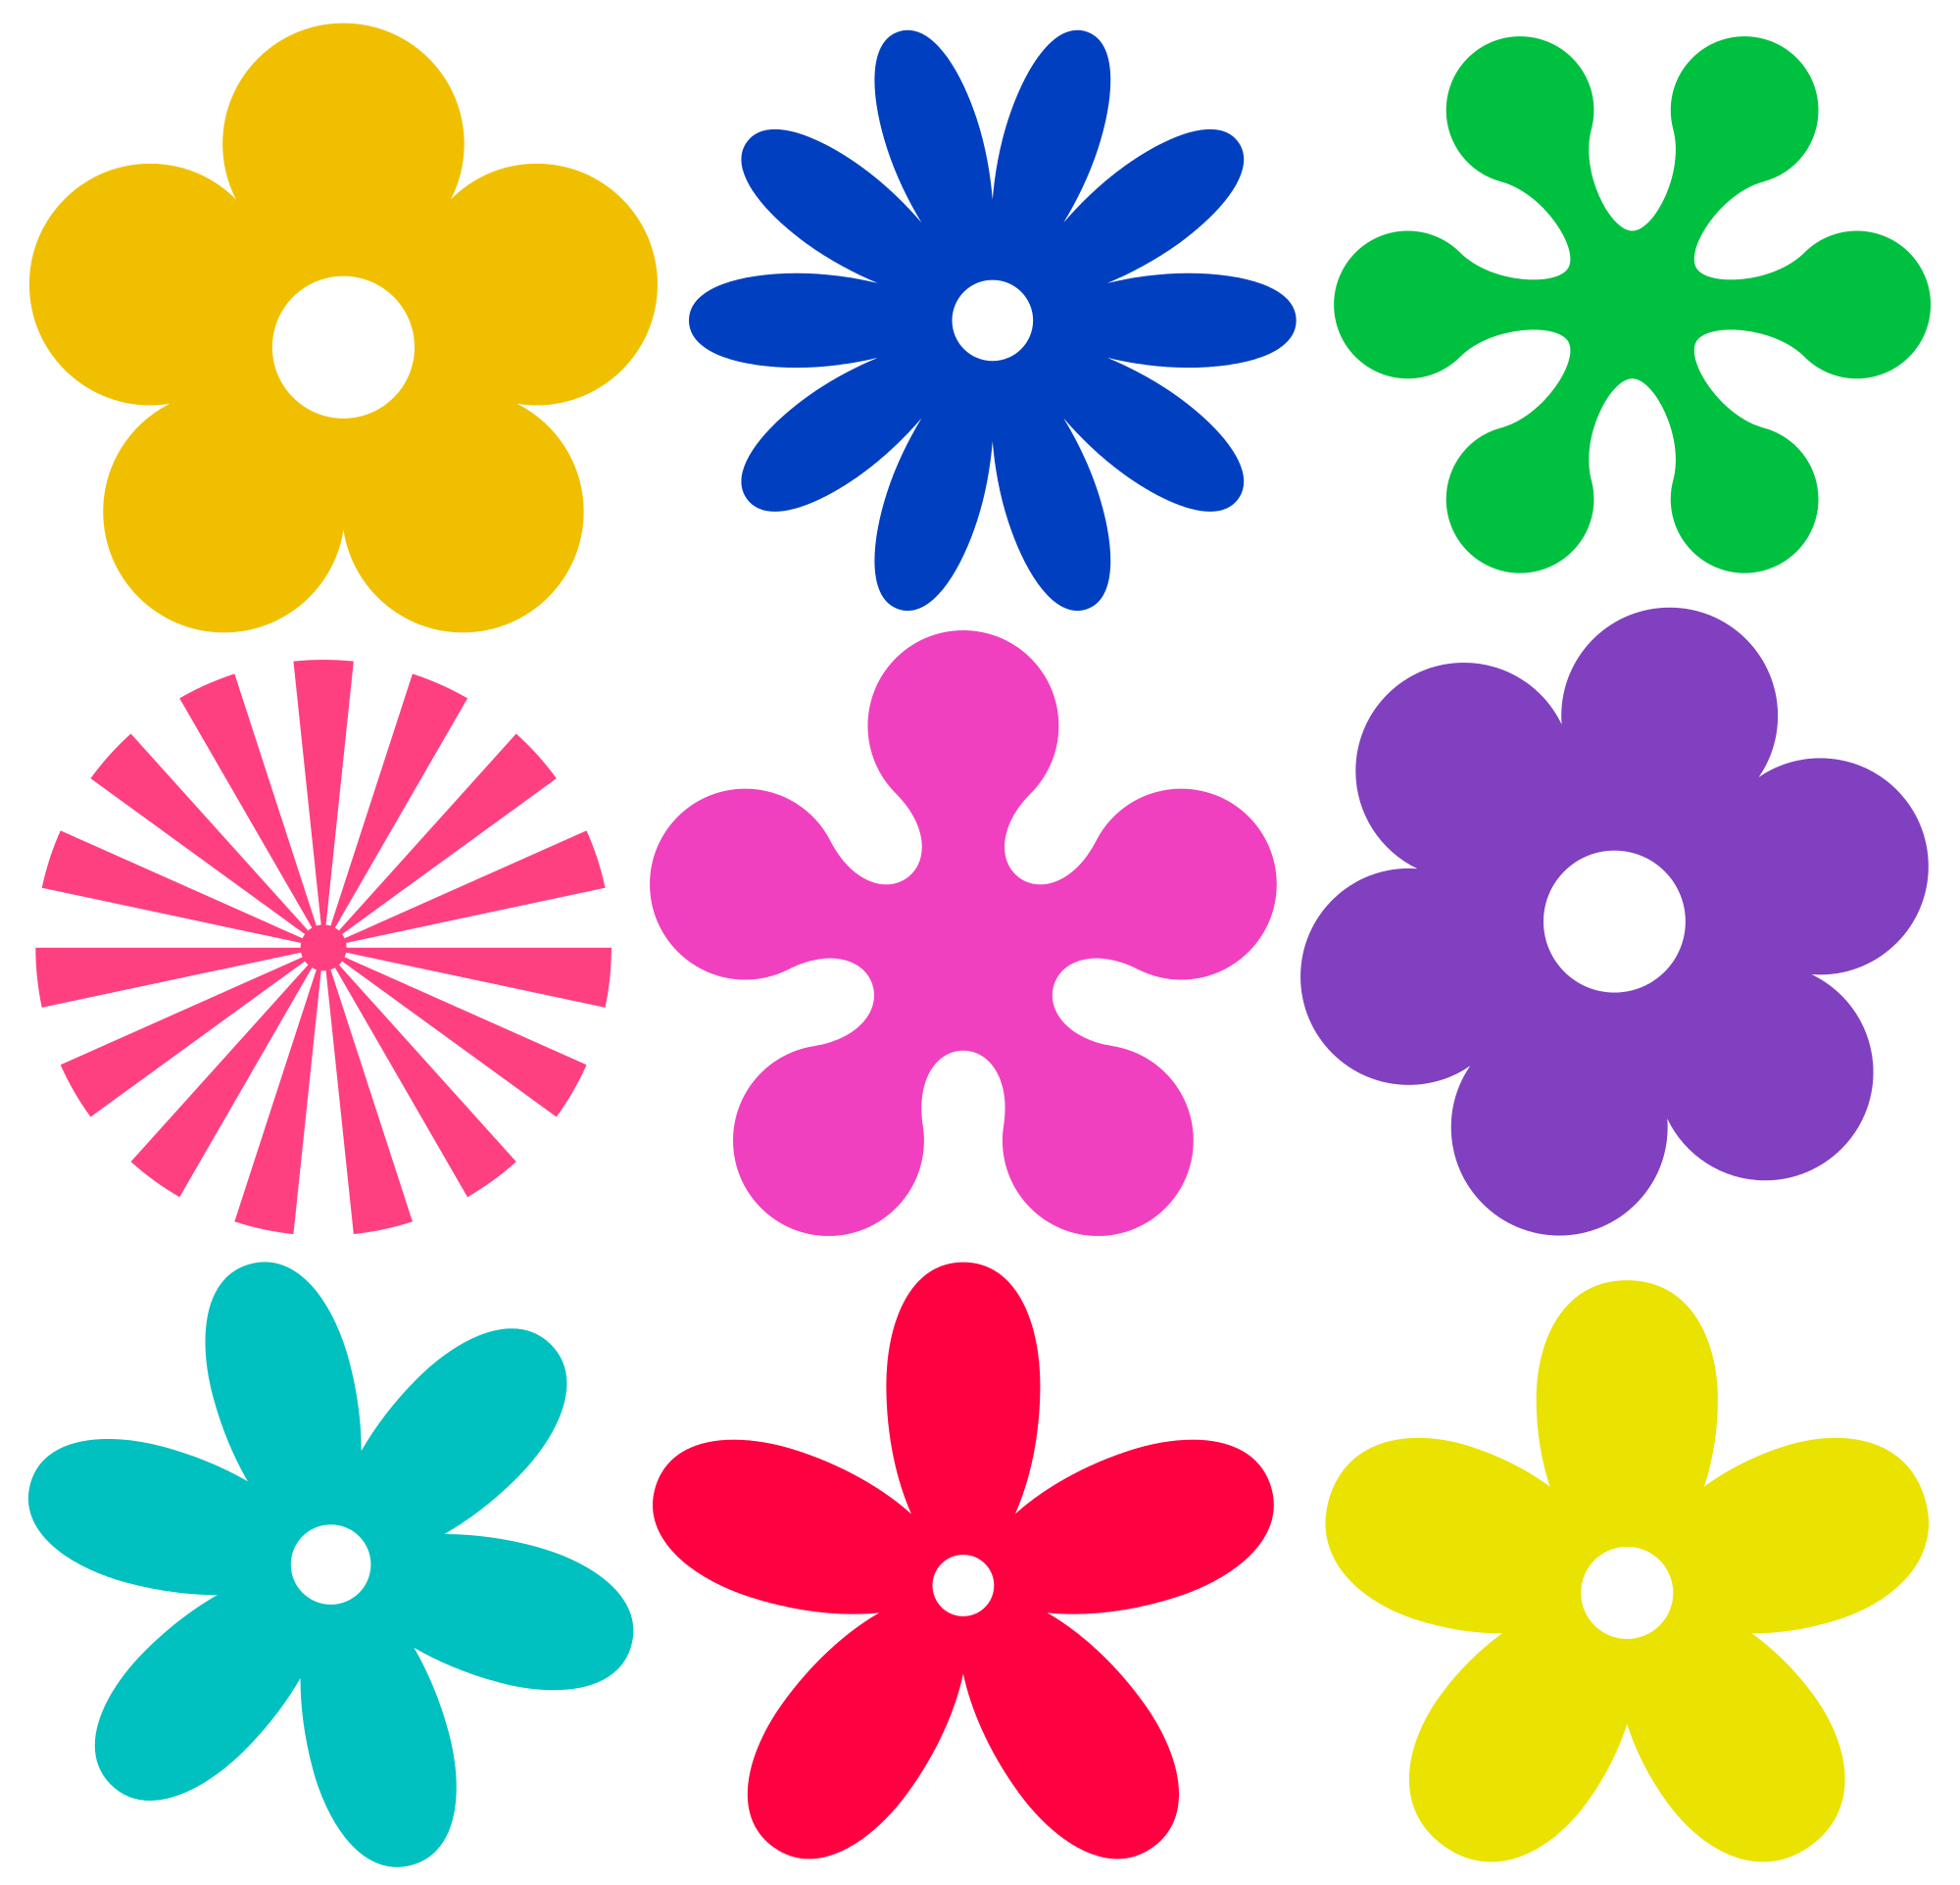 jpg transparent stock Hippie flowers png file. Vector color retro